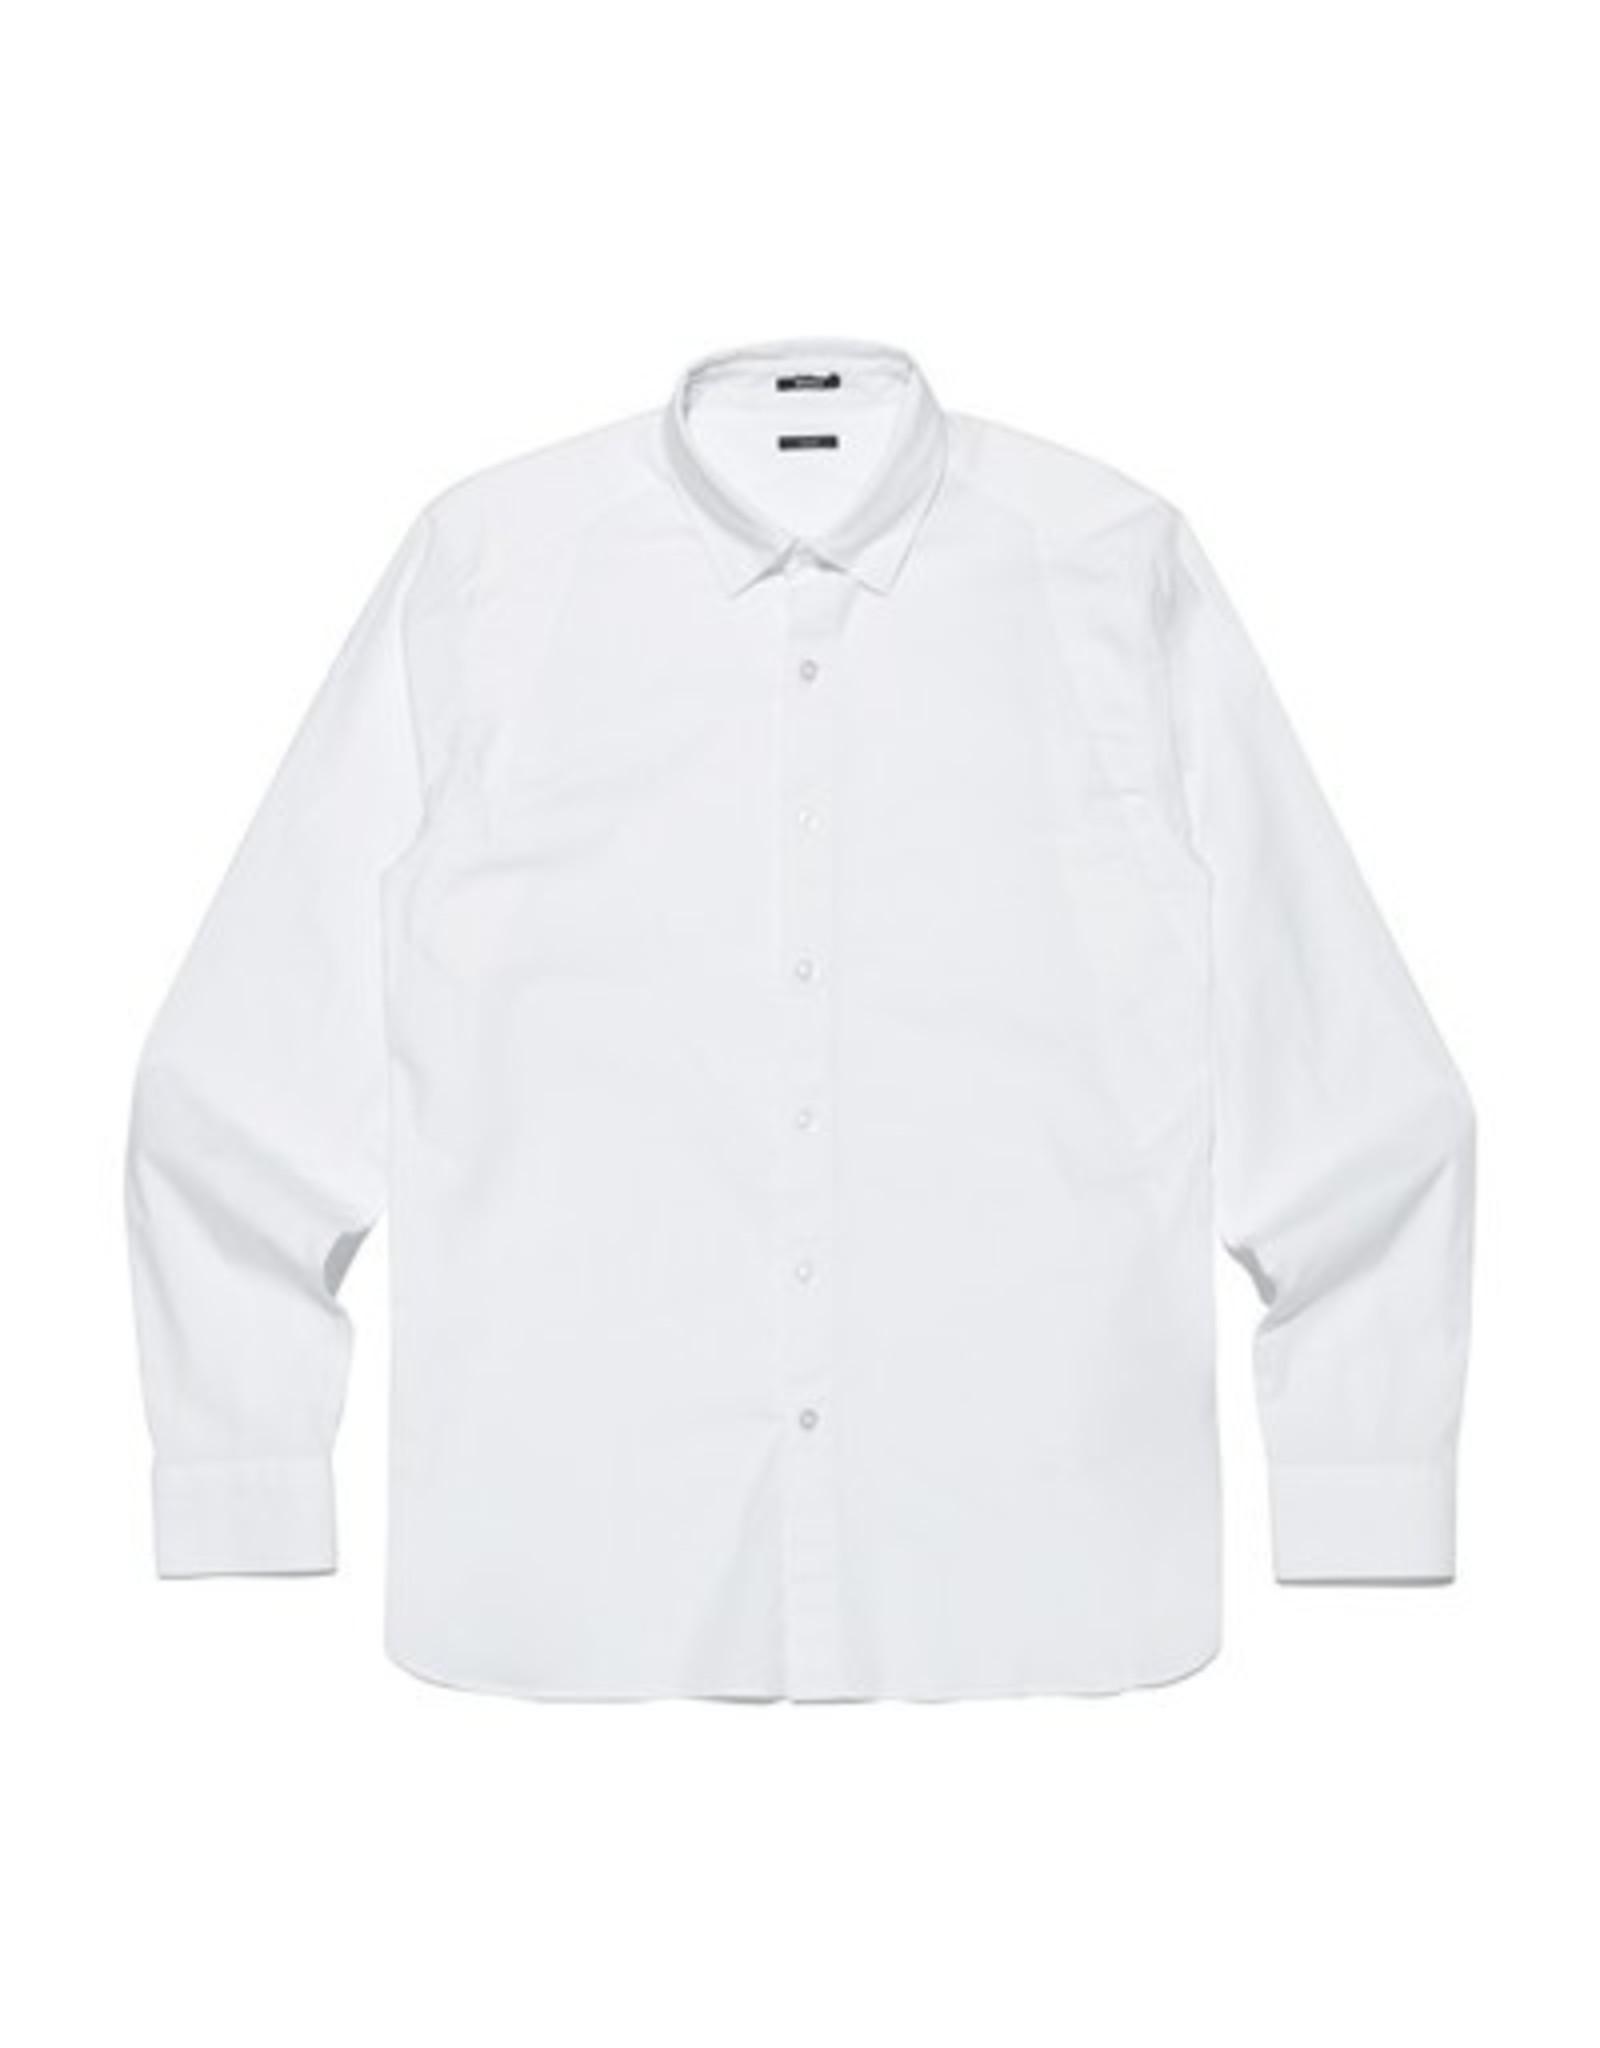 Denham Plus Shirt SP white